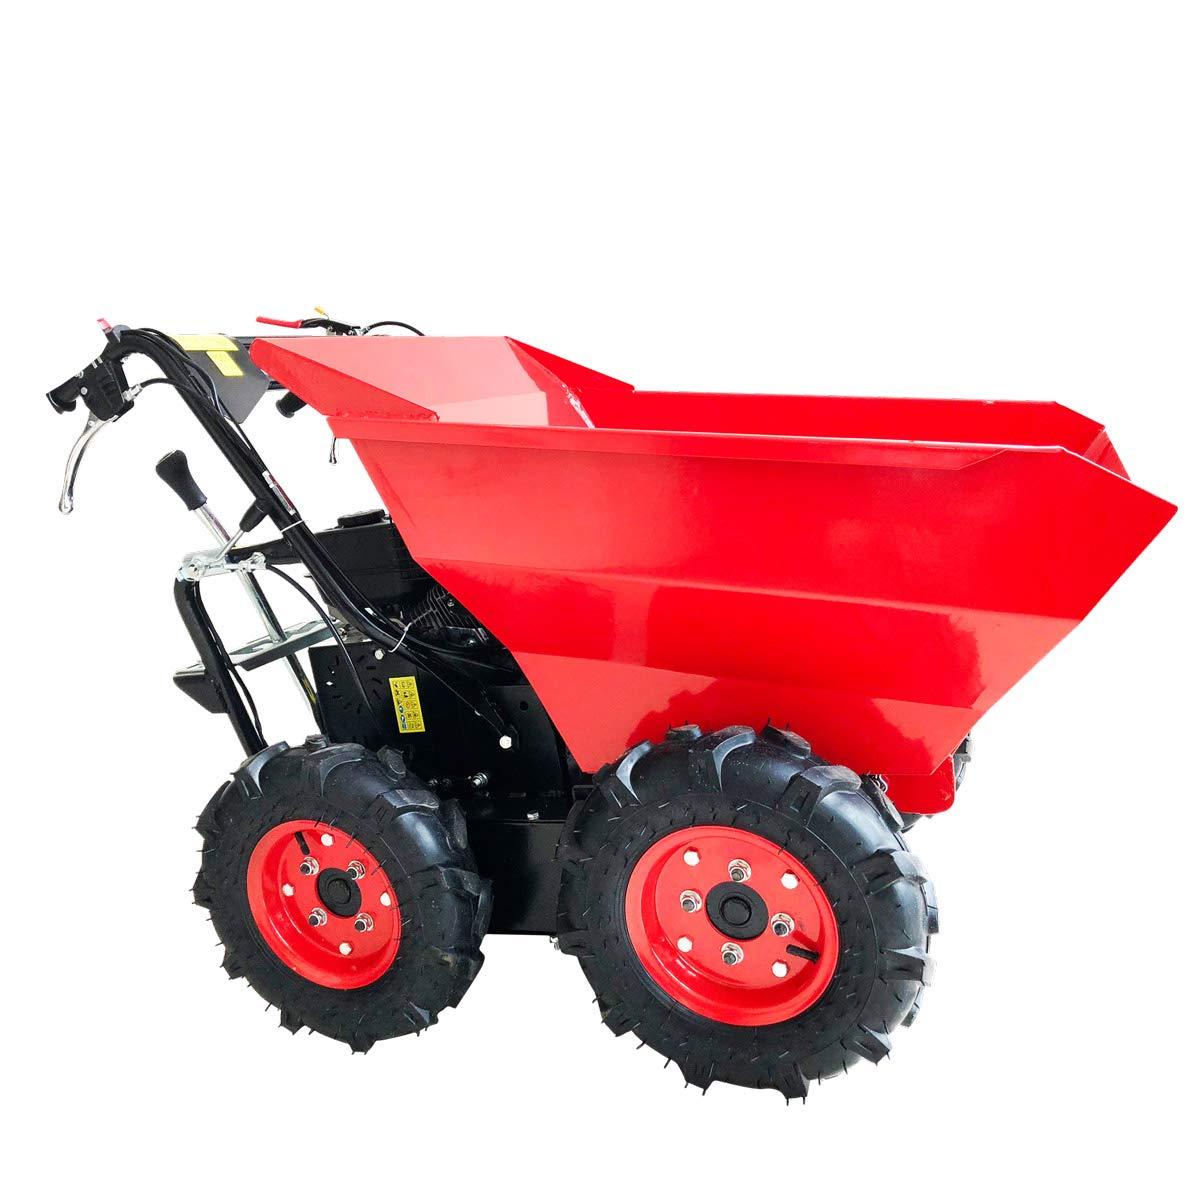 BRAST Benzin Muldenkipper Mini-Dumper Motor-Schubkarre Dumper Radlader 4, 8kw/6, 5PS Allradantrieb 300 kg Traglast